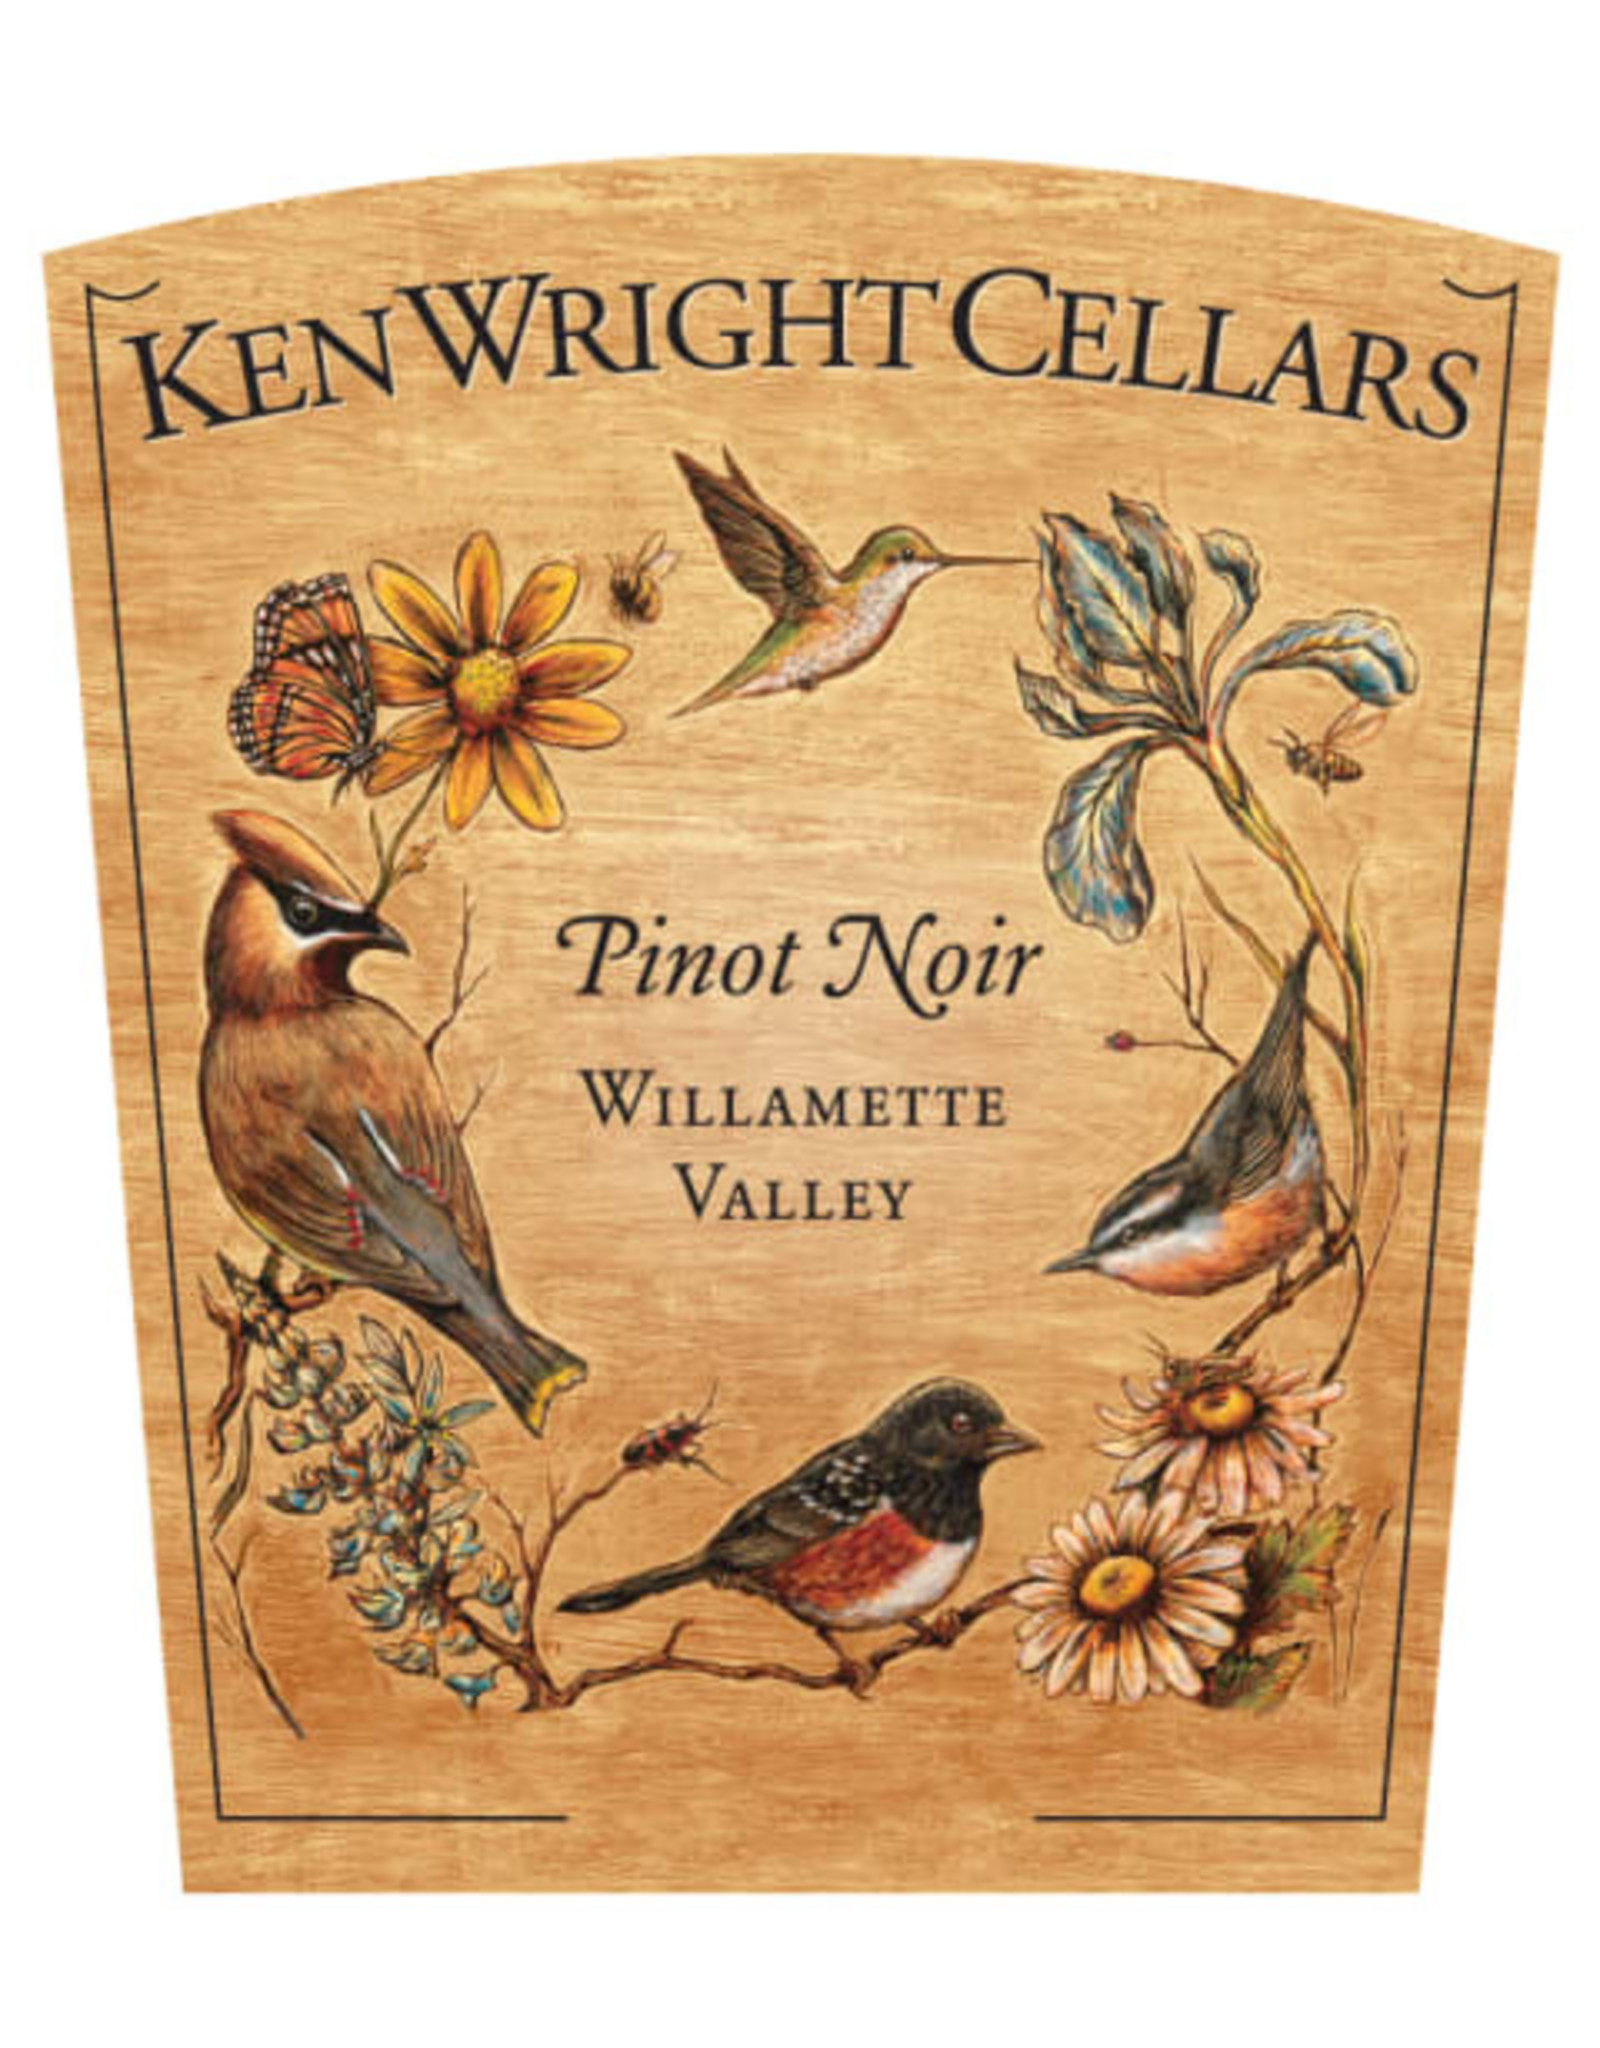 Ken Wright Cellars Ken Wright Cellars Pinot Noir, Willamette Valley 2019